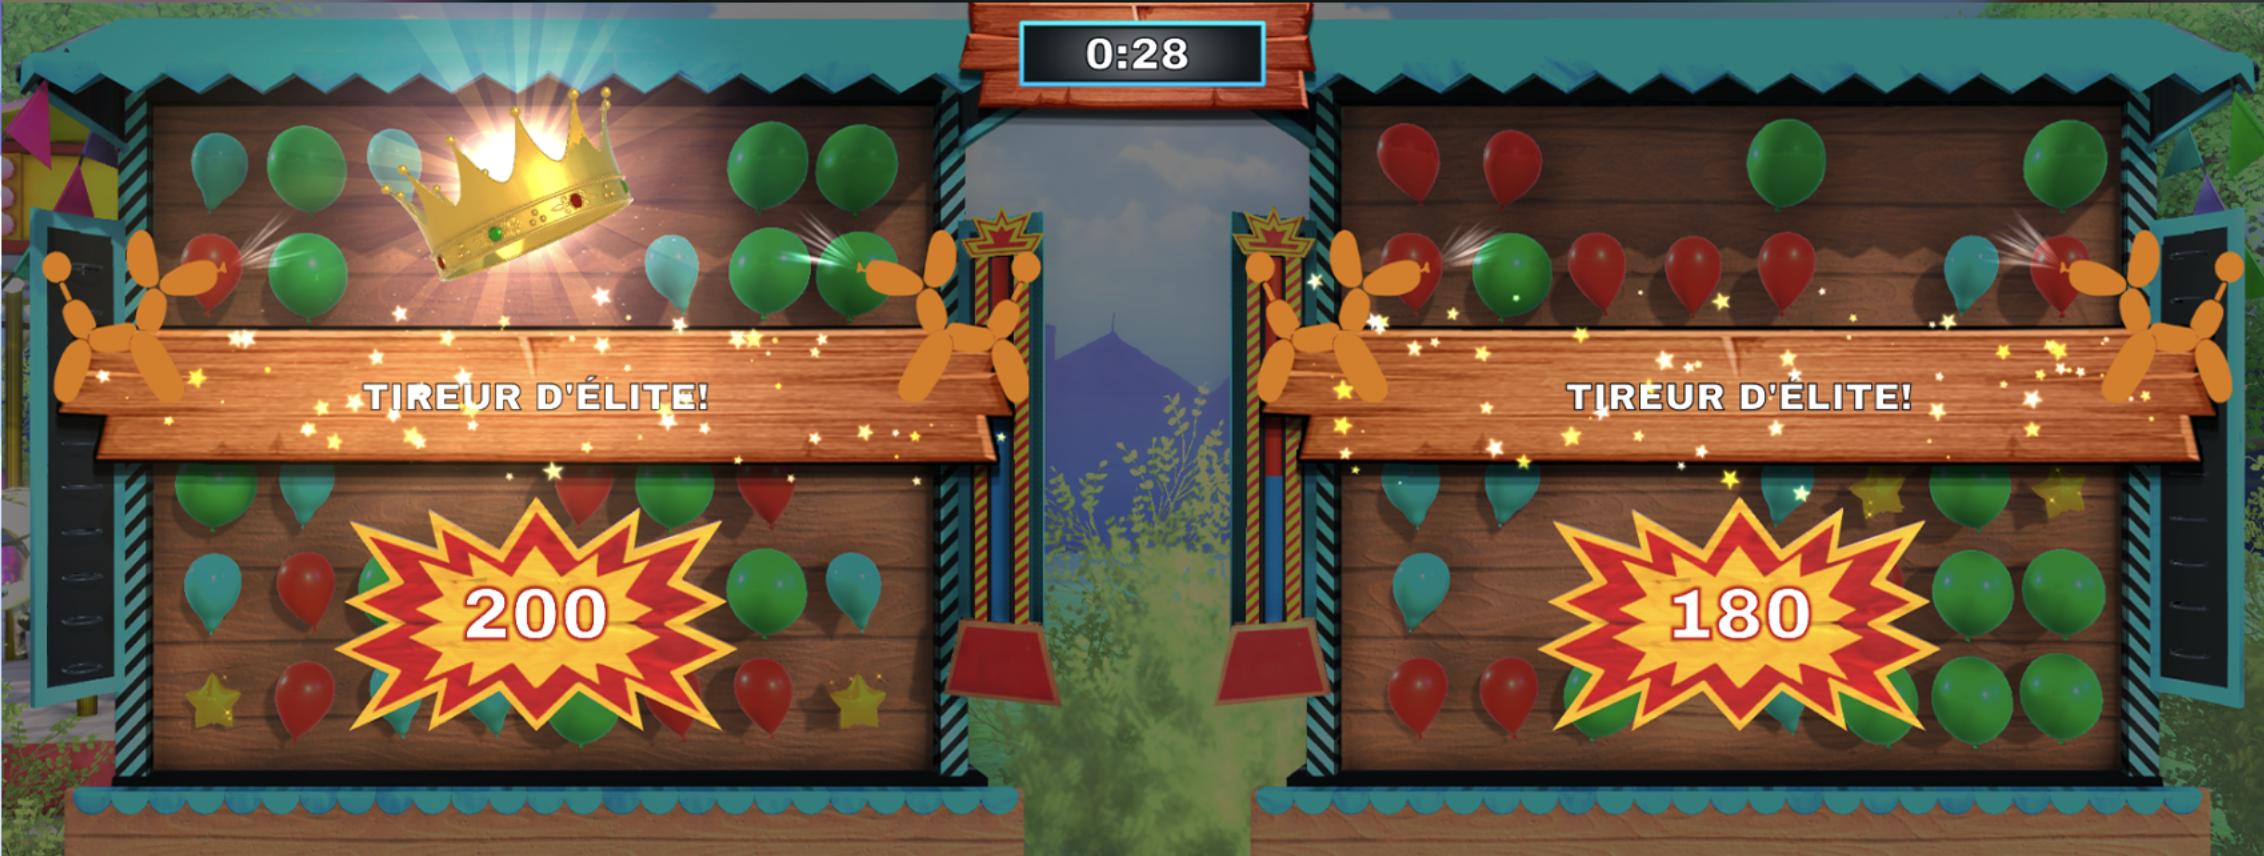 Balloon pop gameplay picture winner